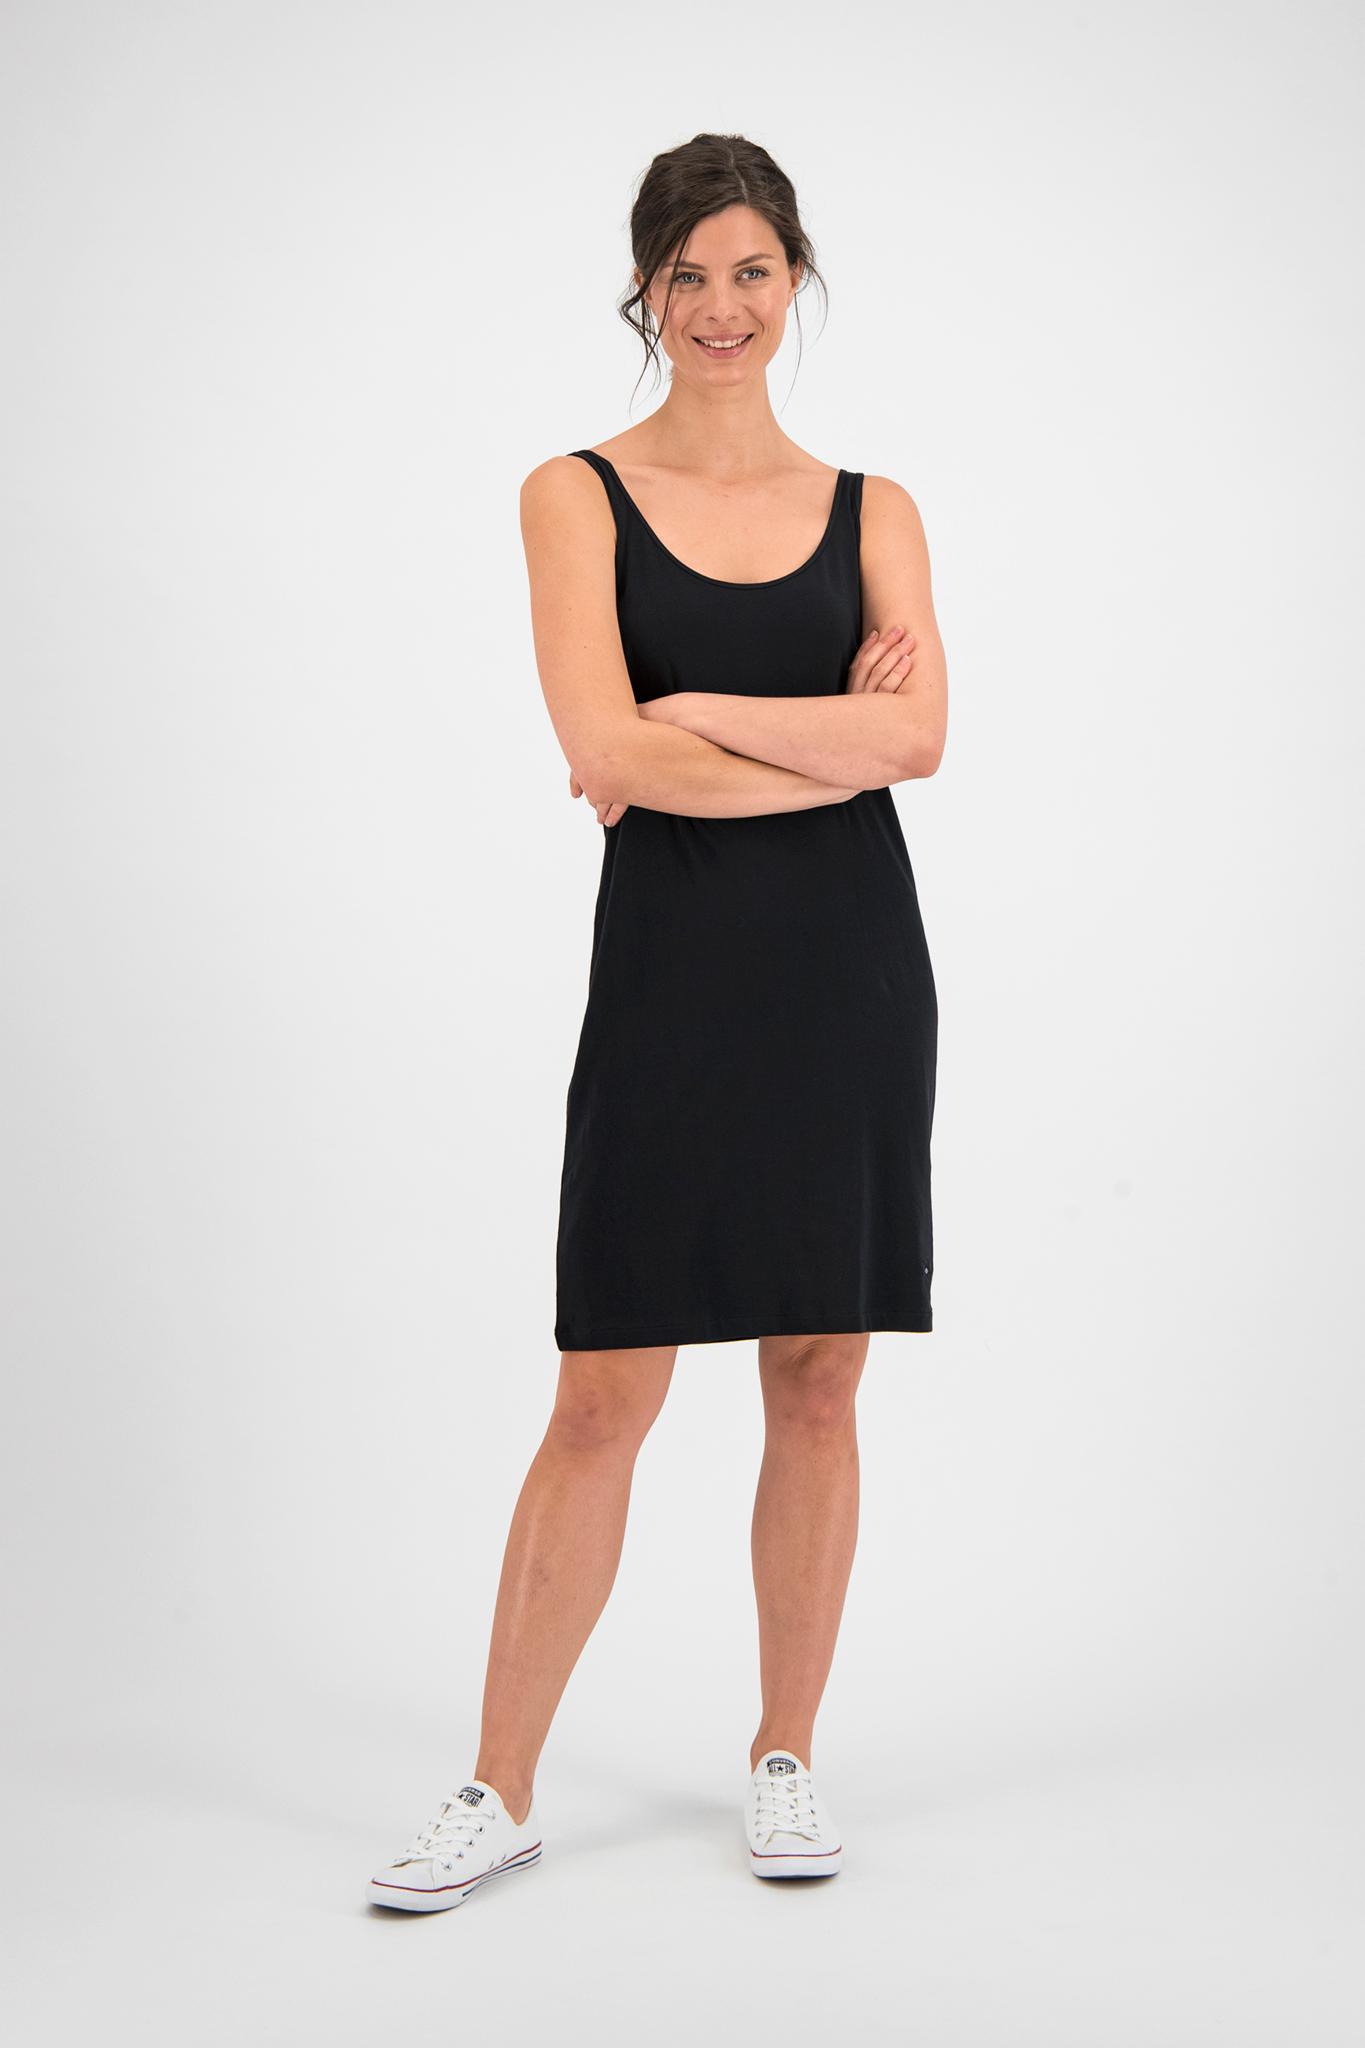 SYLVER Cotton Elasthan Underdress - Black